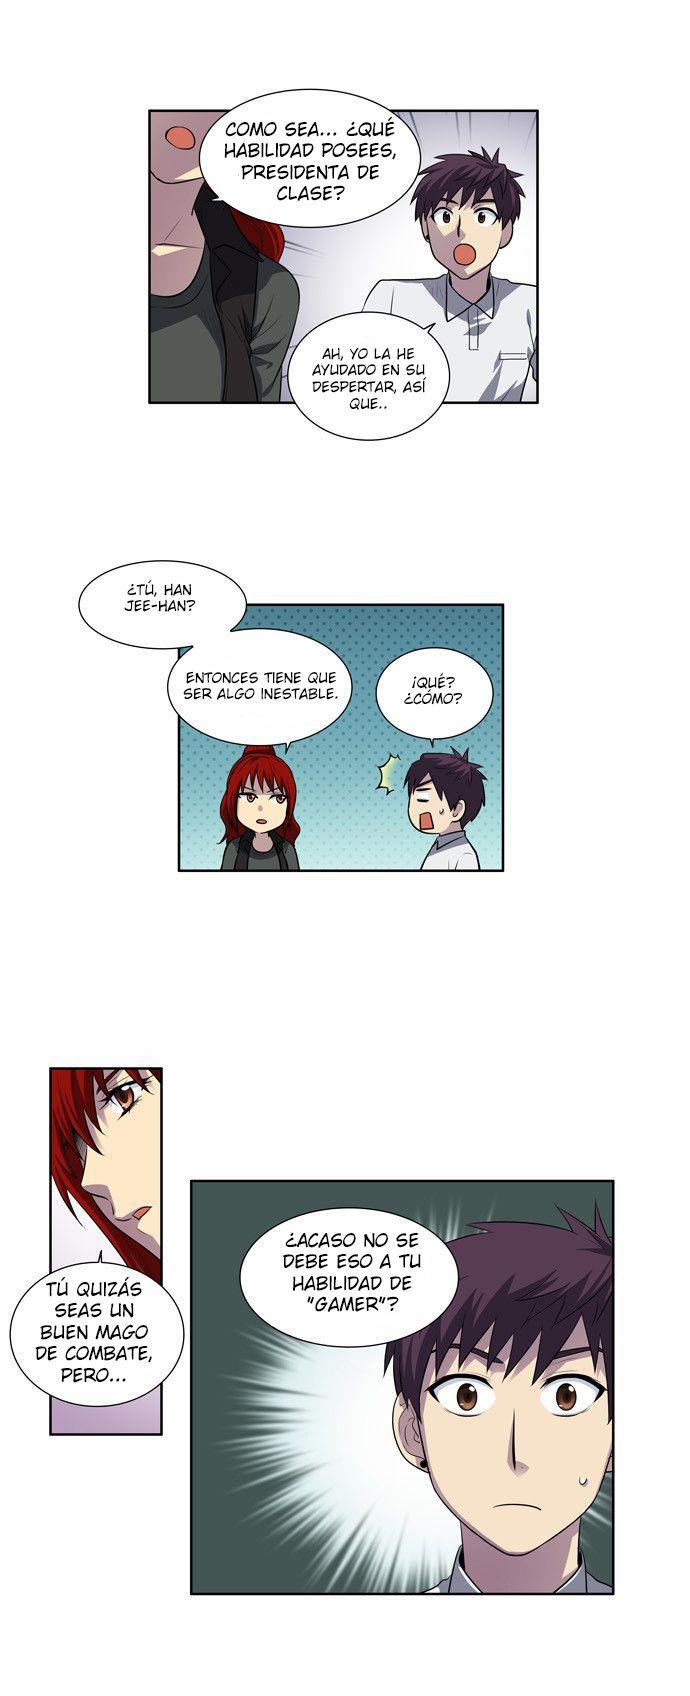 http://c5.ninemanga.com/es_manga/61/1725/476787/72646075926e45adf5c64c3d0e908a7b.jpg Page 8